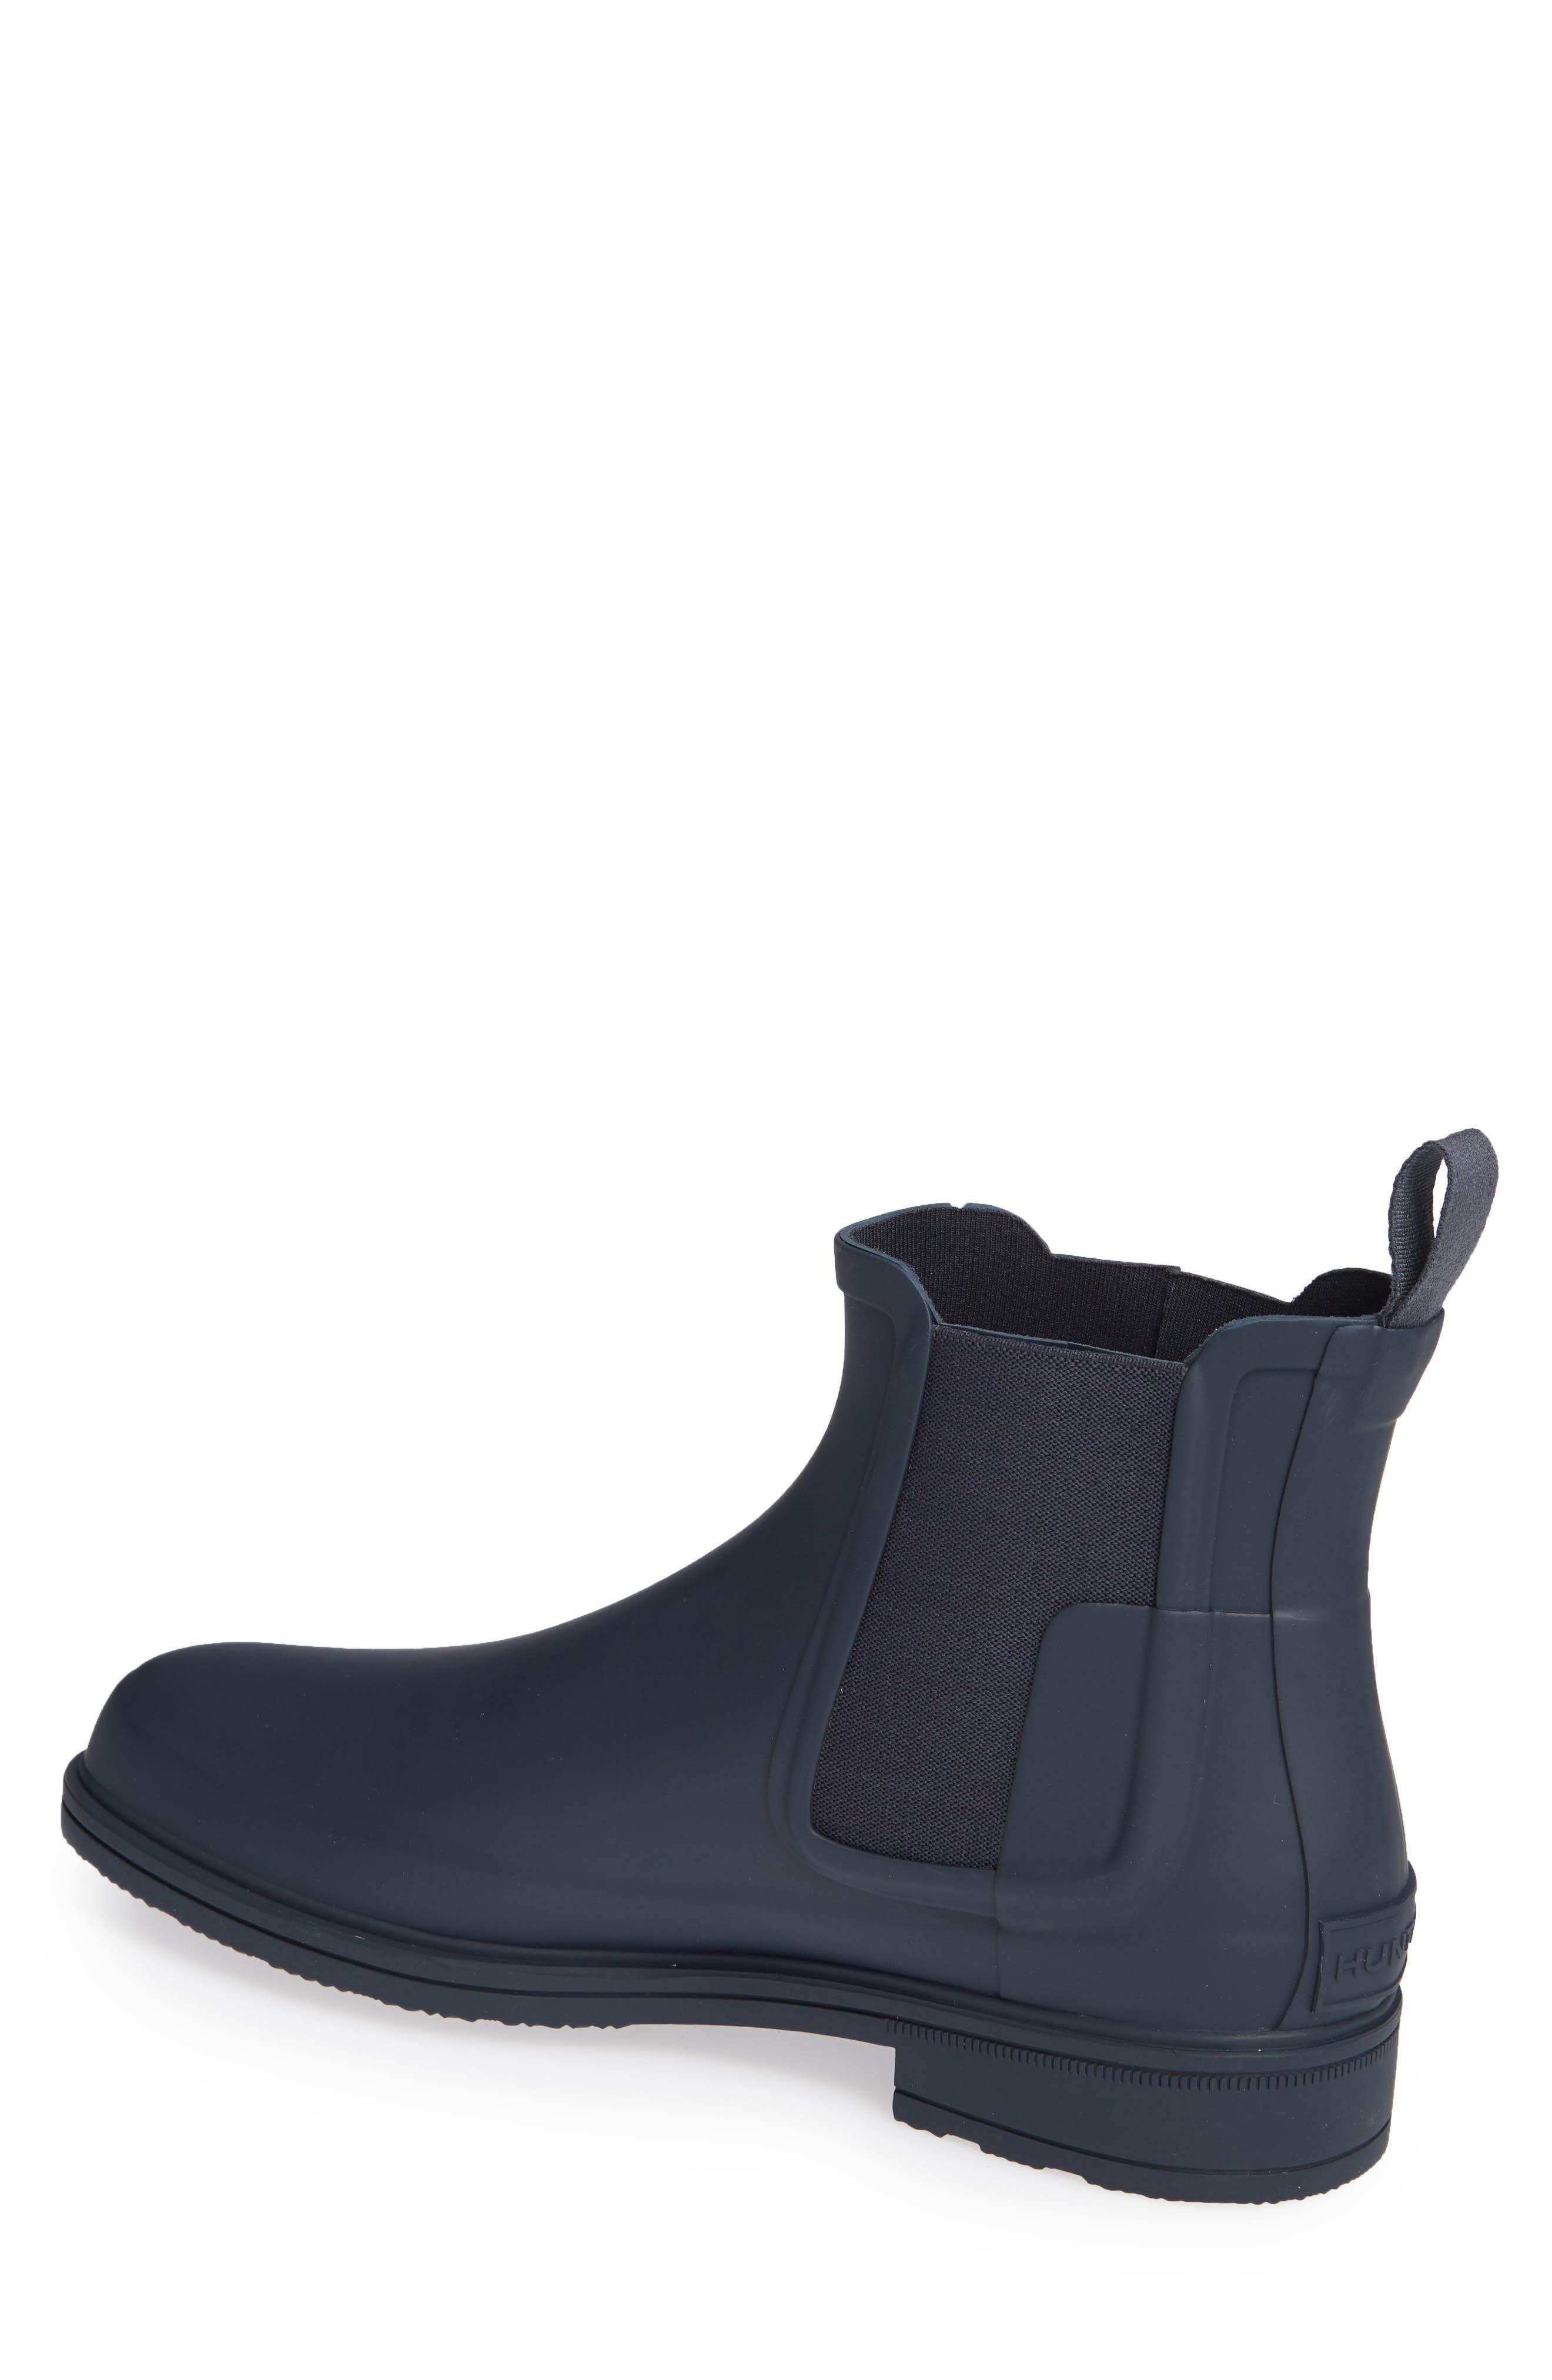 HUNTER,                             Original Refined Waterproof Chelsea Boot,                             Alternate thumbnail 2, color,                             NAVY RUBBER